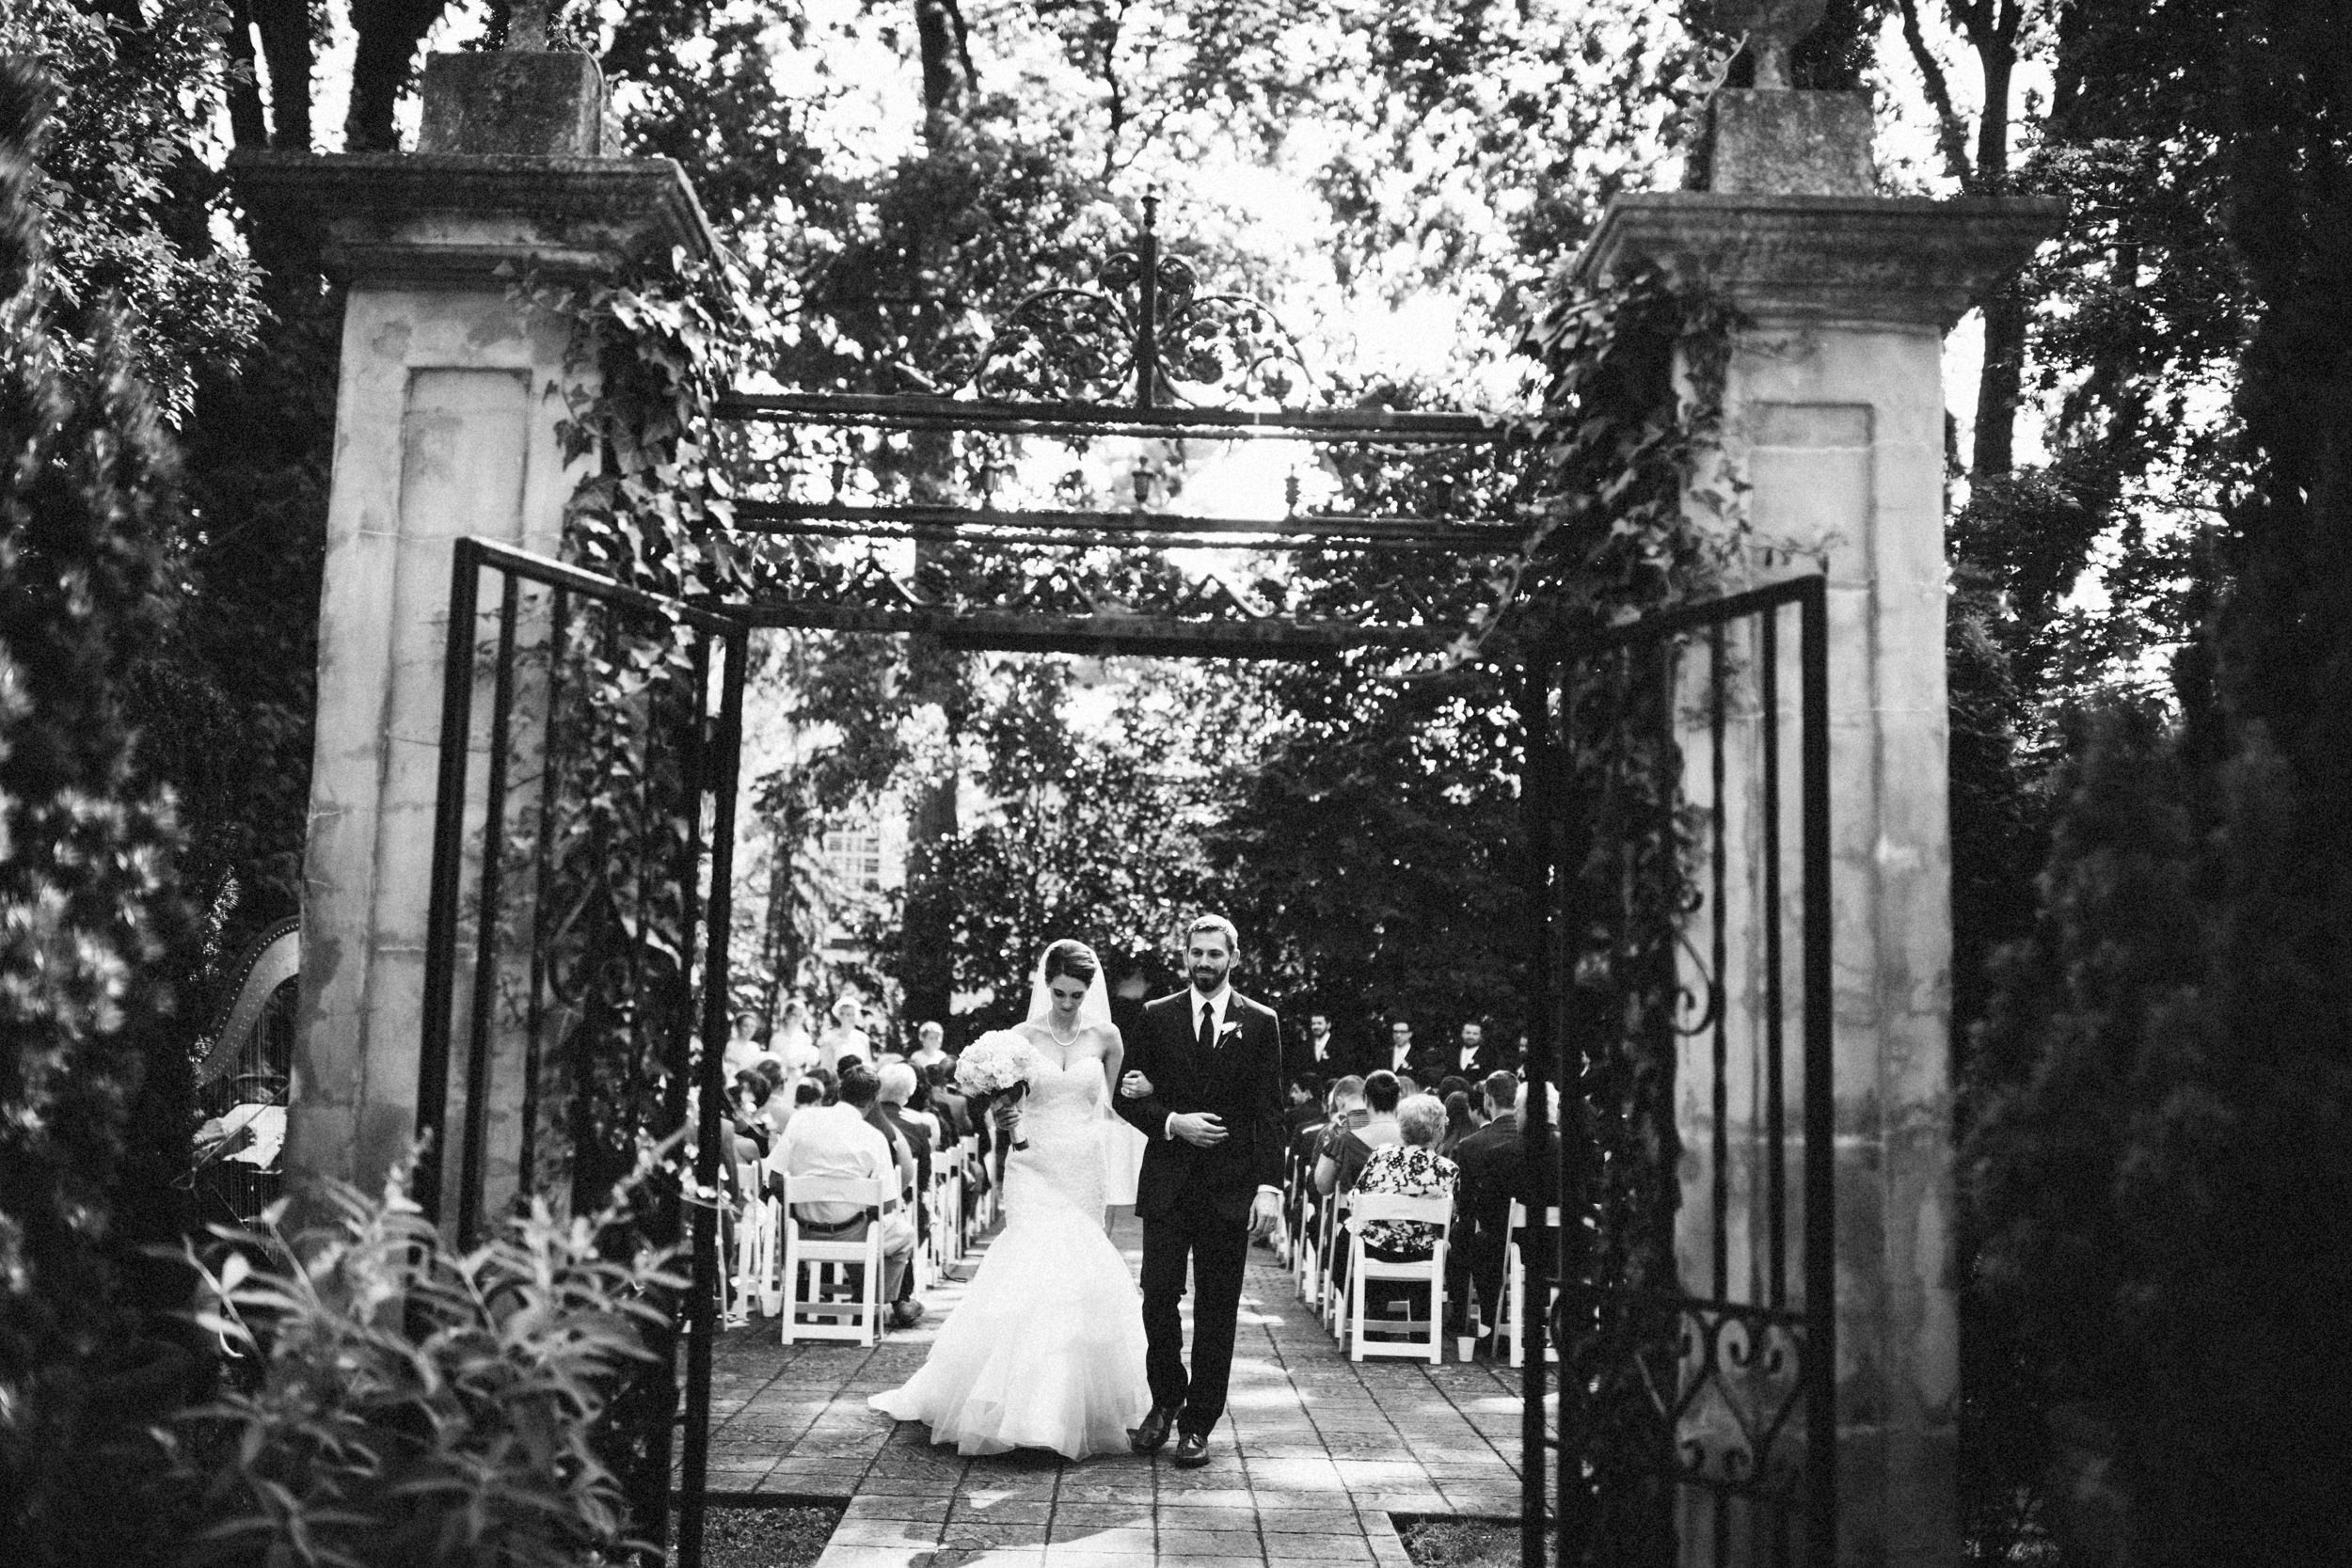 Louisville-Kentucky-Wedding-Elopement-Photographer-Sarah-Katherine-Davis-Photography-Whitehall-Classic-Timeless-Garden-Wedding-433.jpg